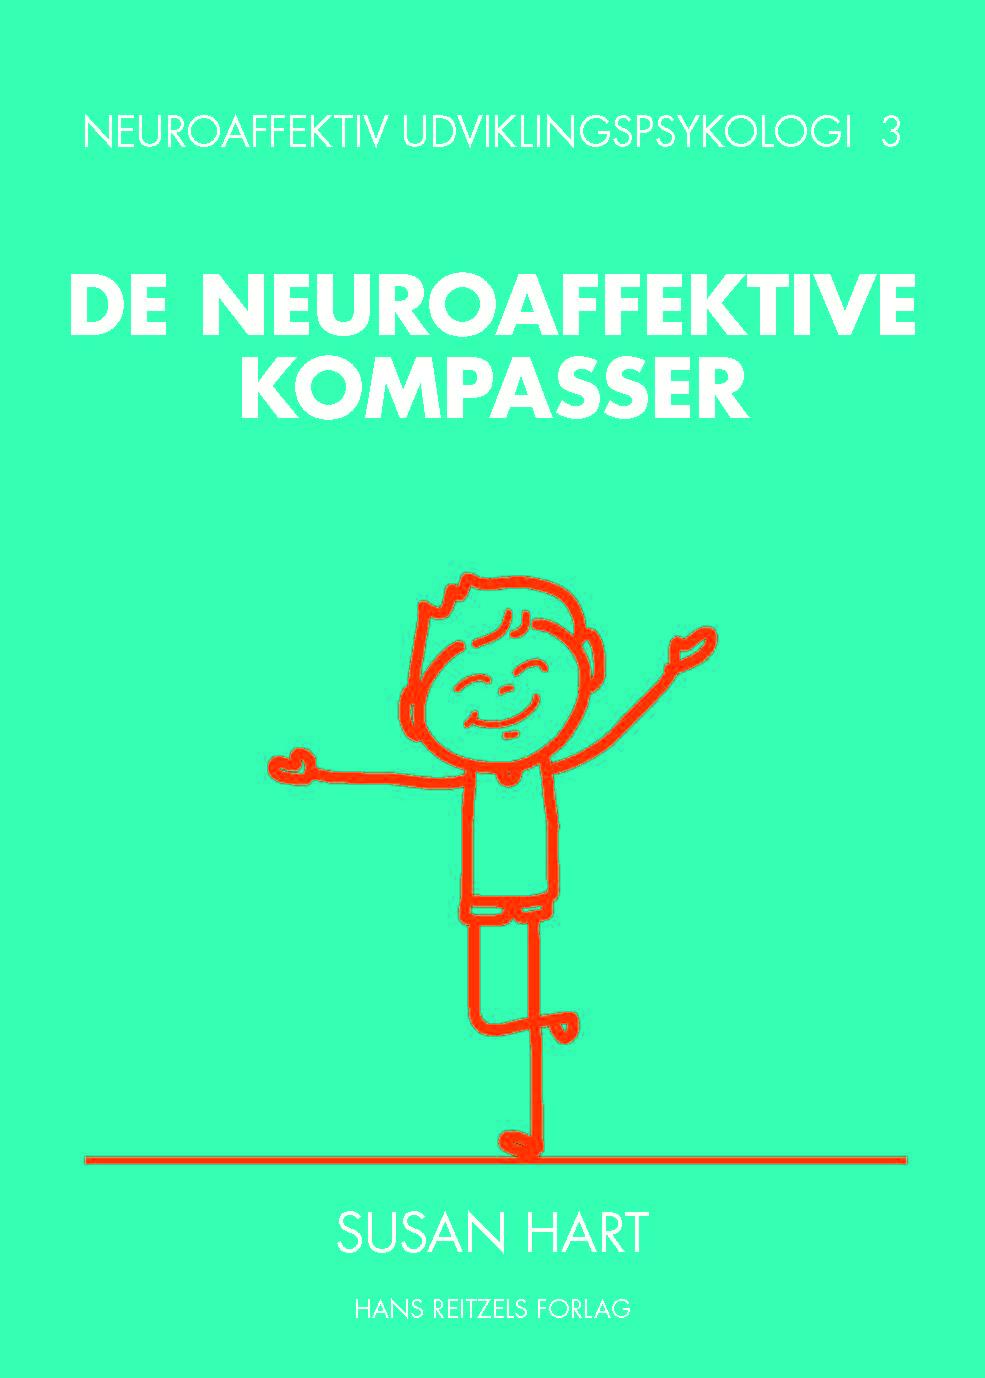 Neuroaffektiv udviklingspsykologi 3